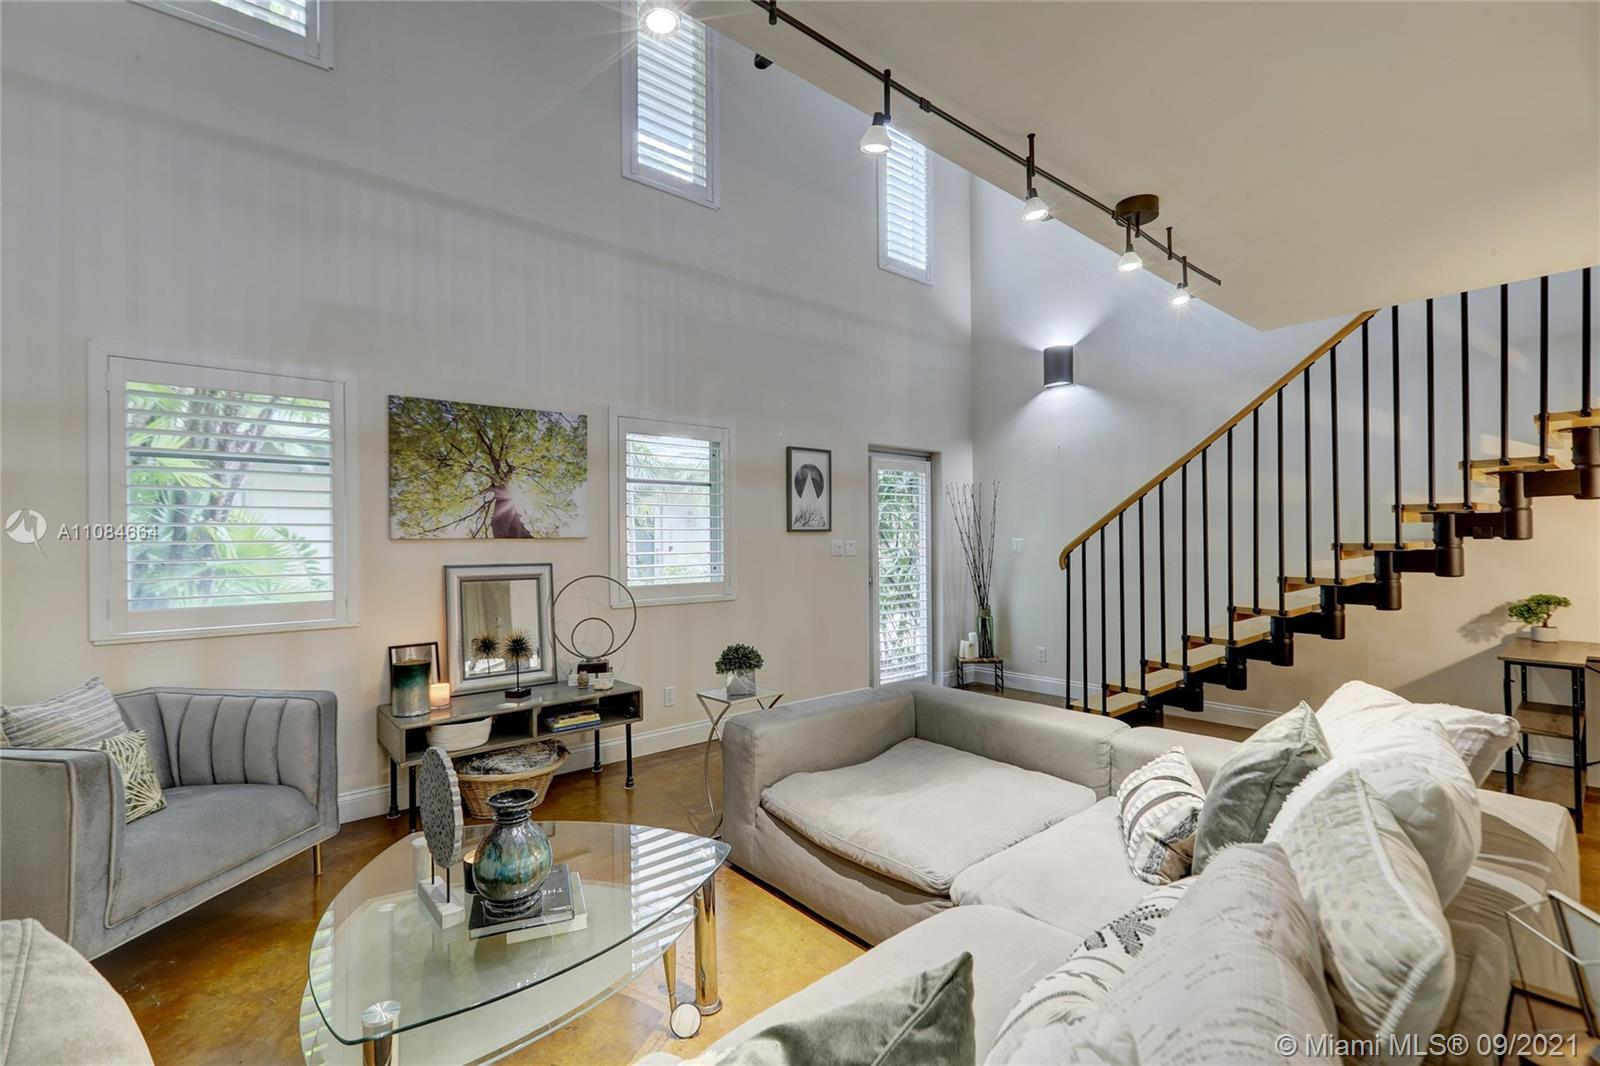 SoNew Lofts offers upscale living, open concept & modern, urban loft style design. 3 story FEE SIMPL